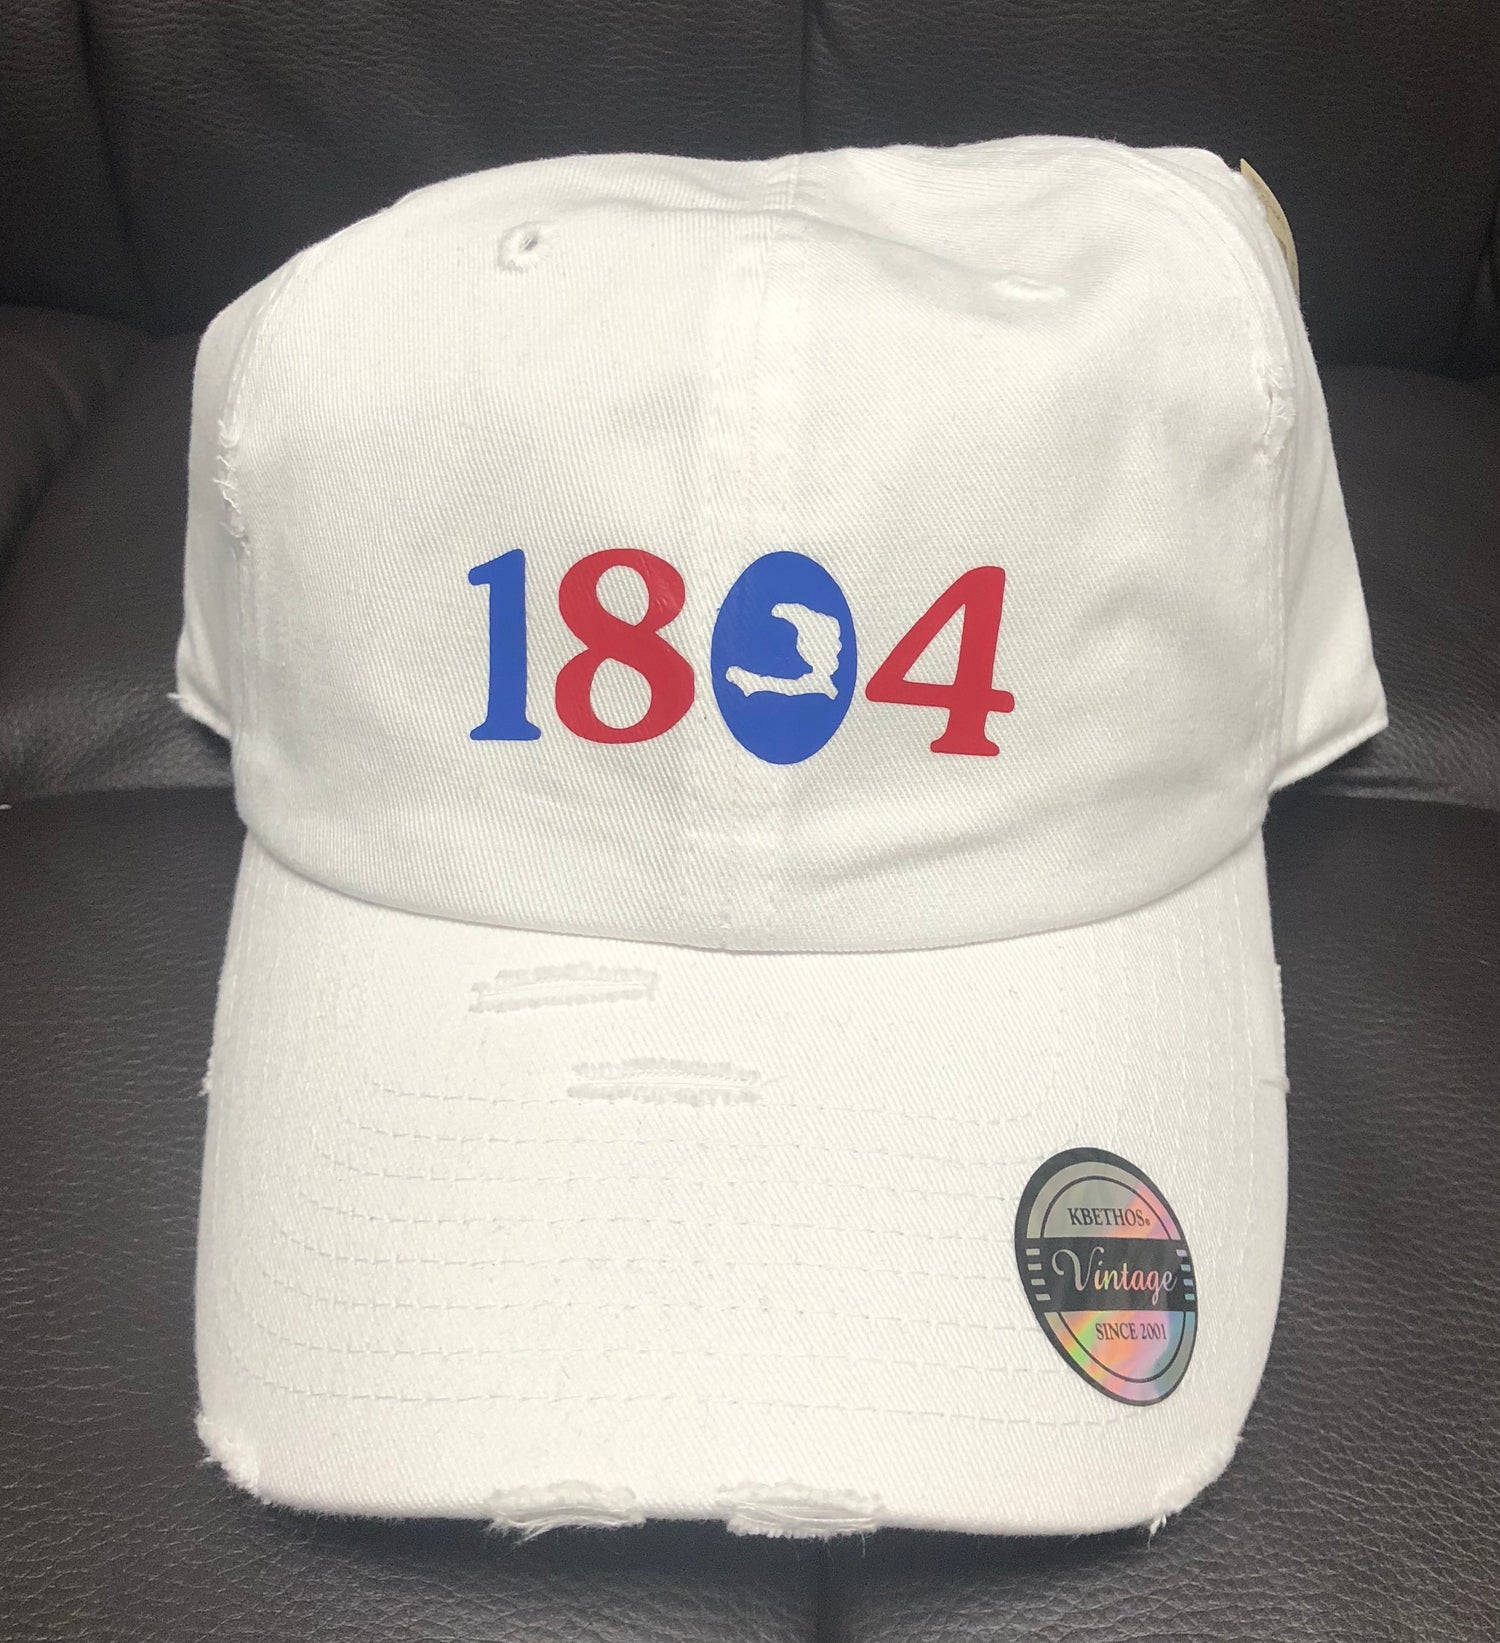 Image of 1804 hat